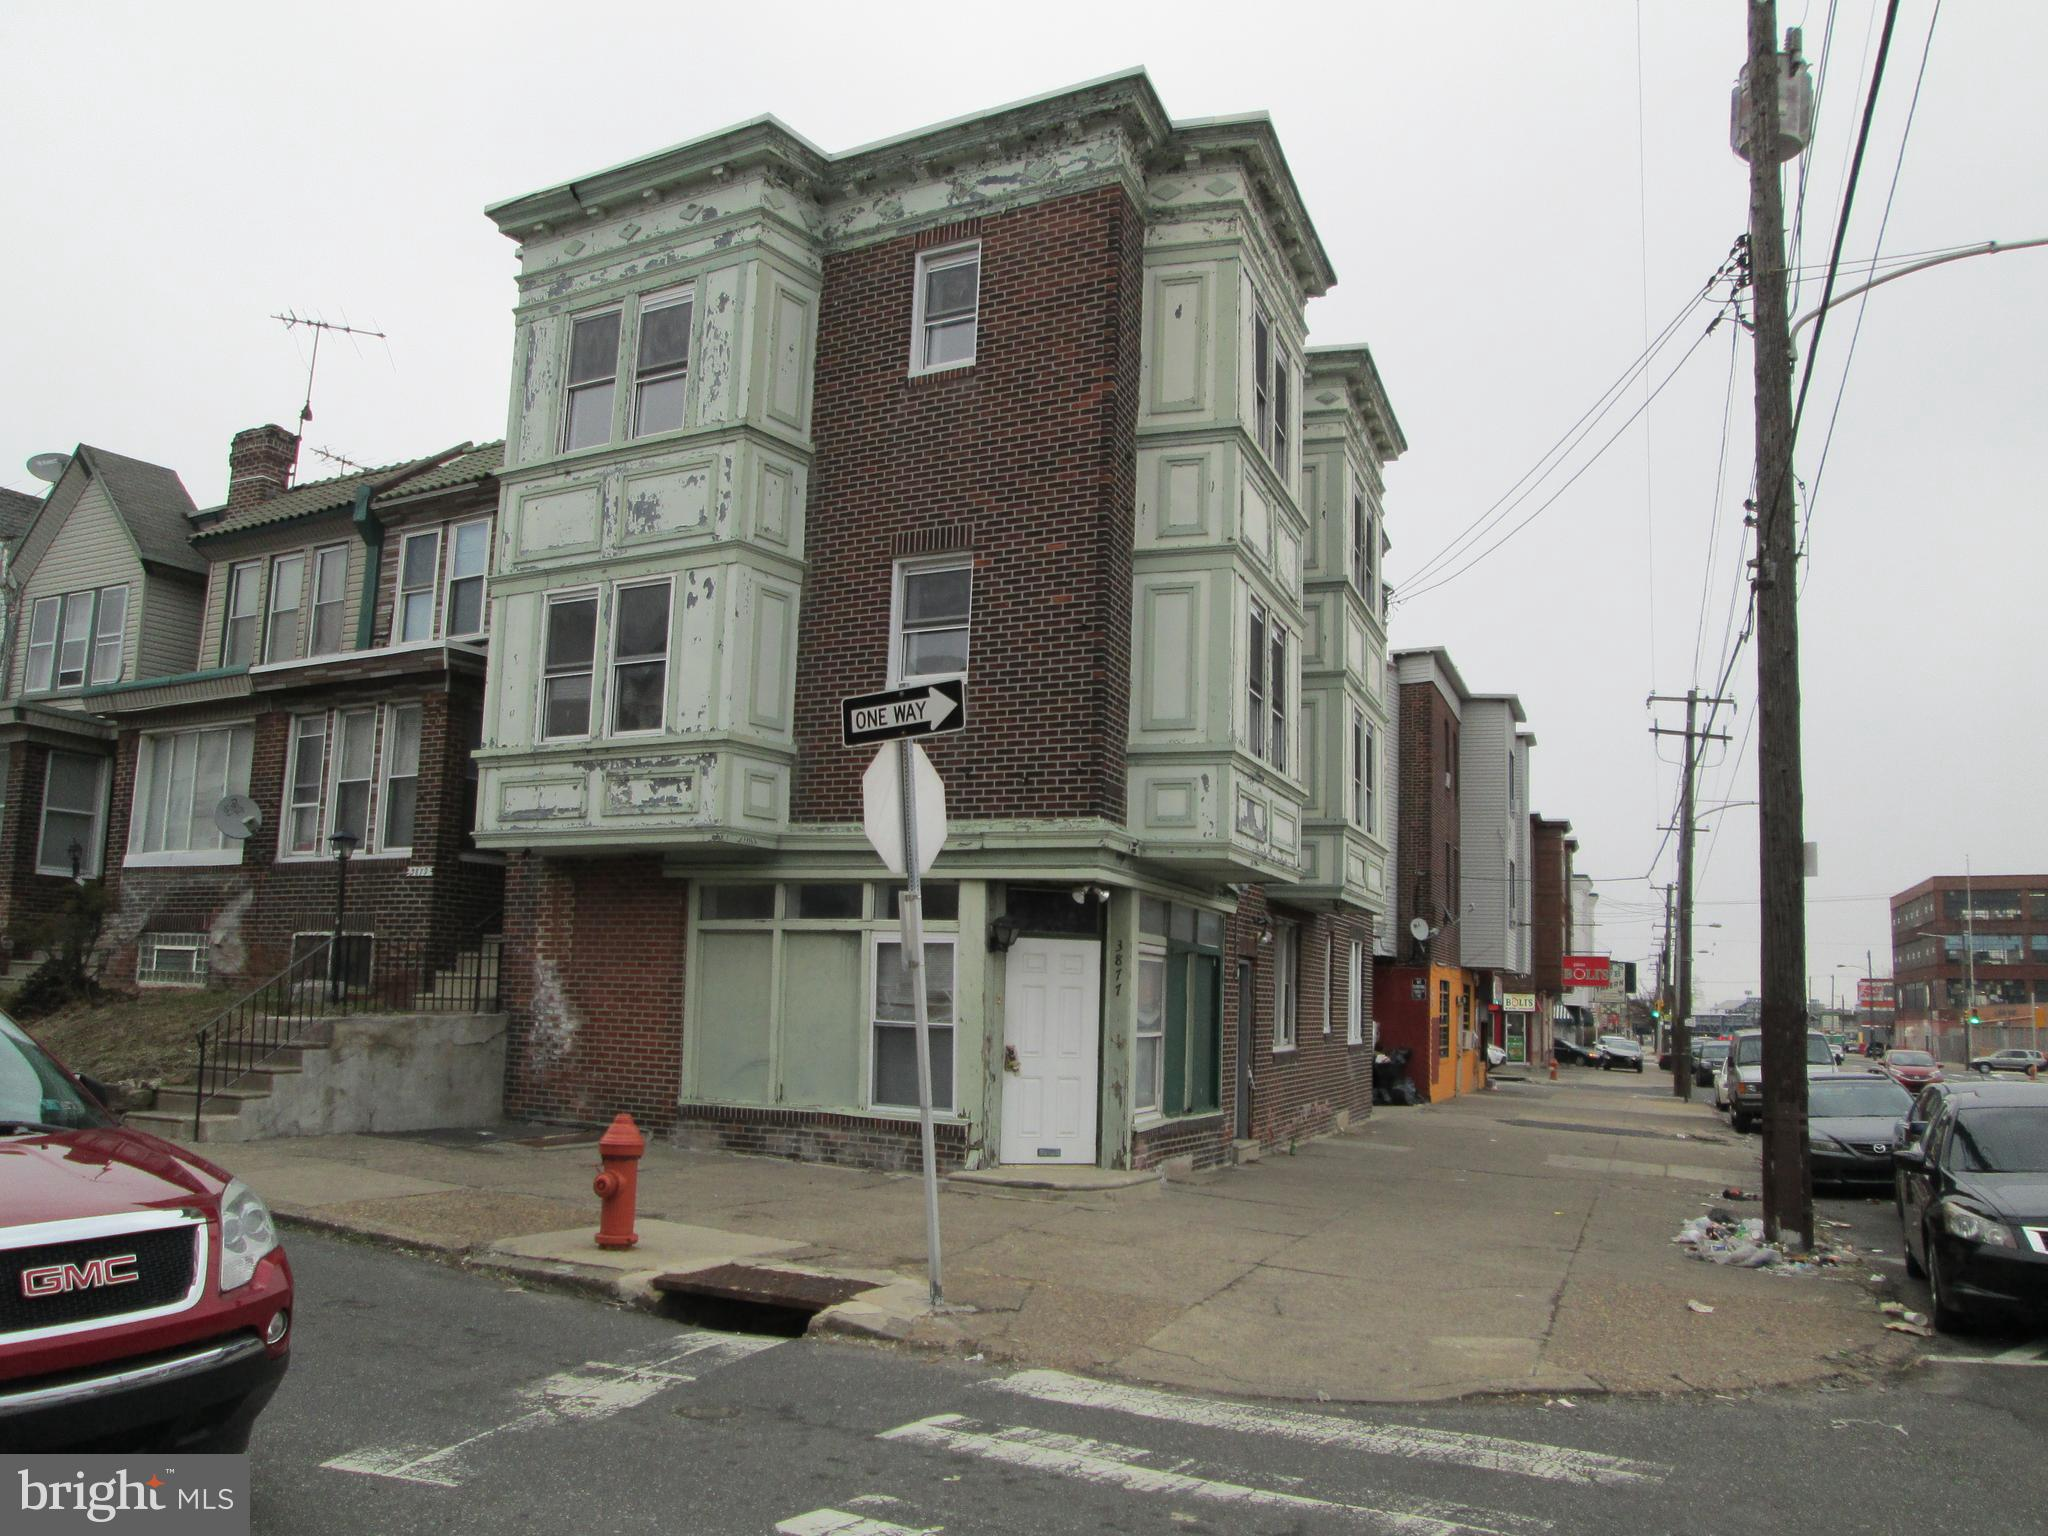 3877 DUNGAN STREET, PHILADELPHIA, PA 19124